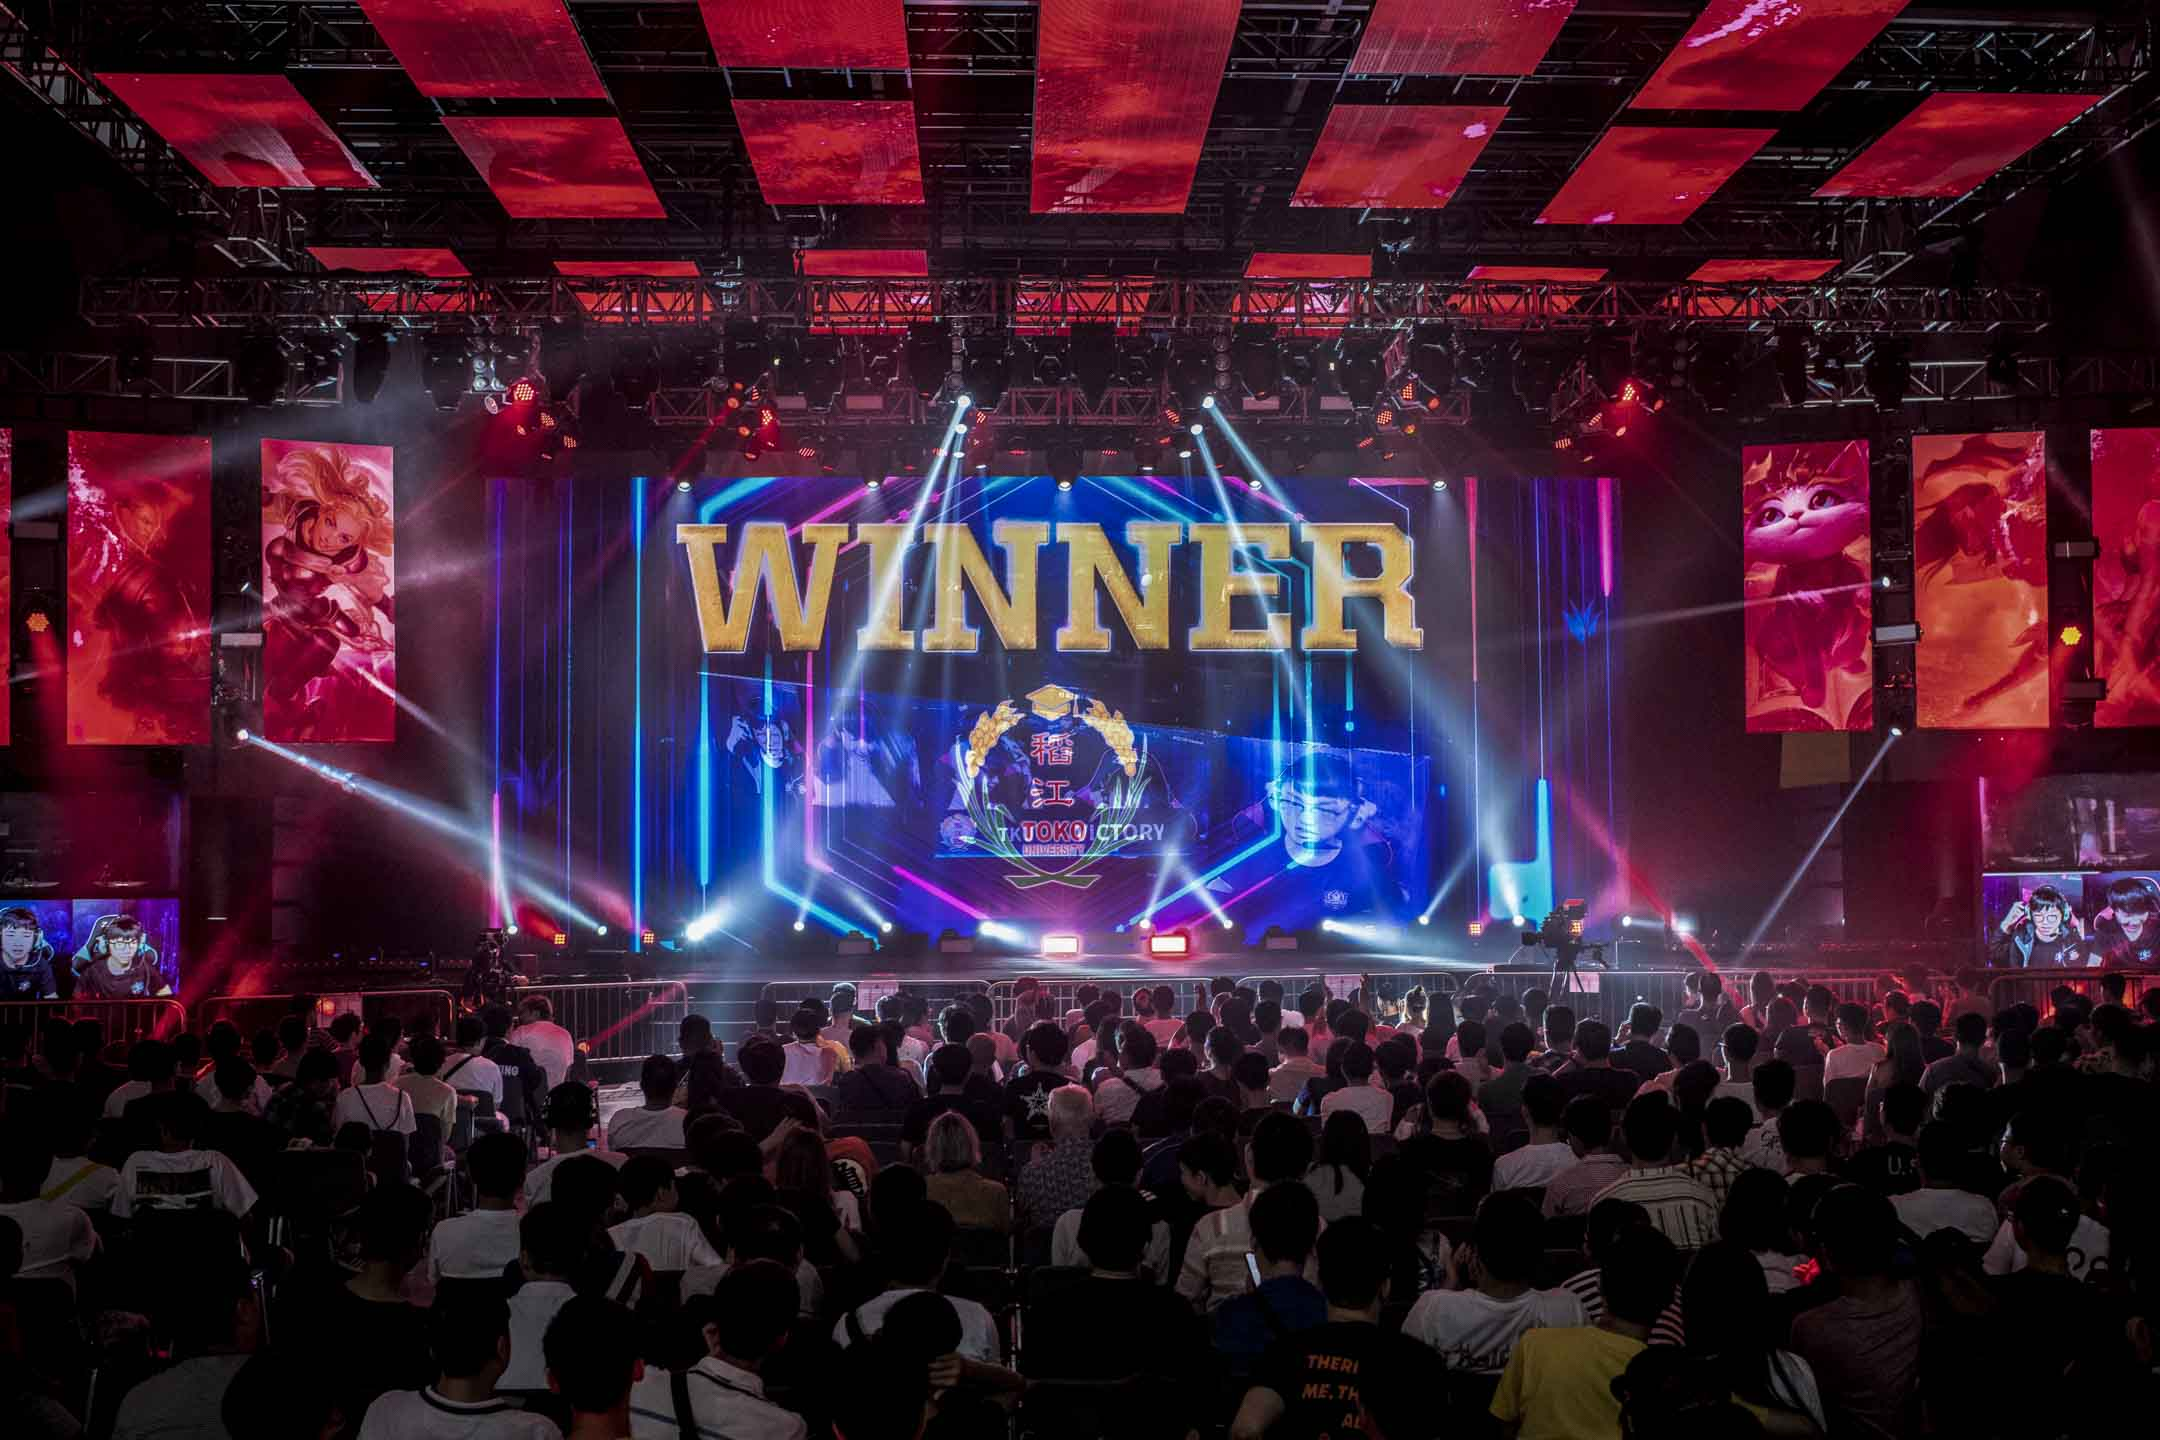 2019年7月27日,2019年香港電競音樂節上,「英雄聯盟國際大學杯」首次在香港上演。 攝: Ivan Abreu/Getty Images for Hong Kong Tourism Board